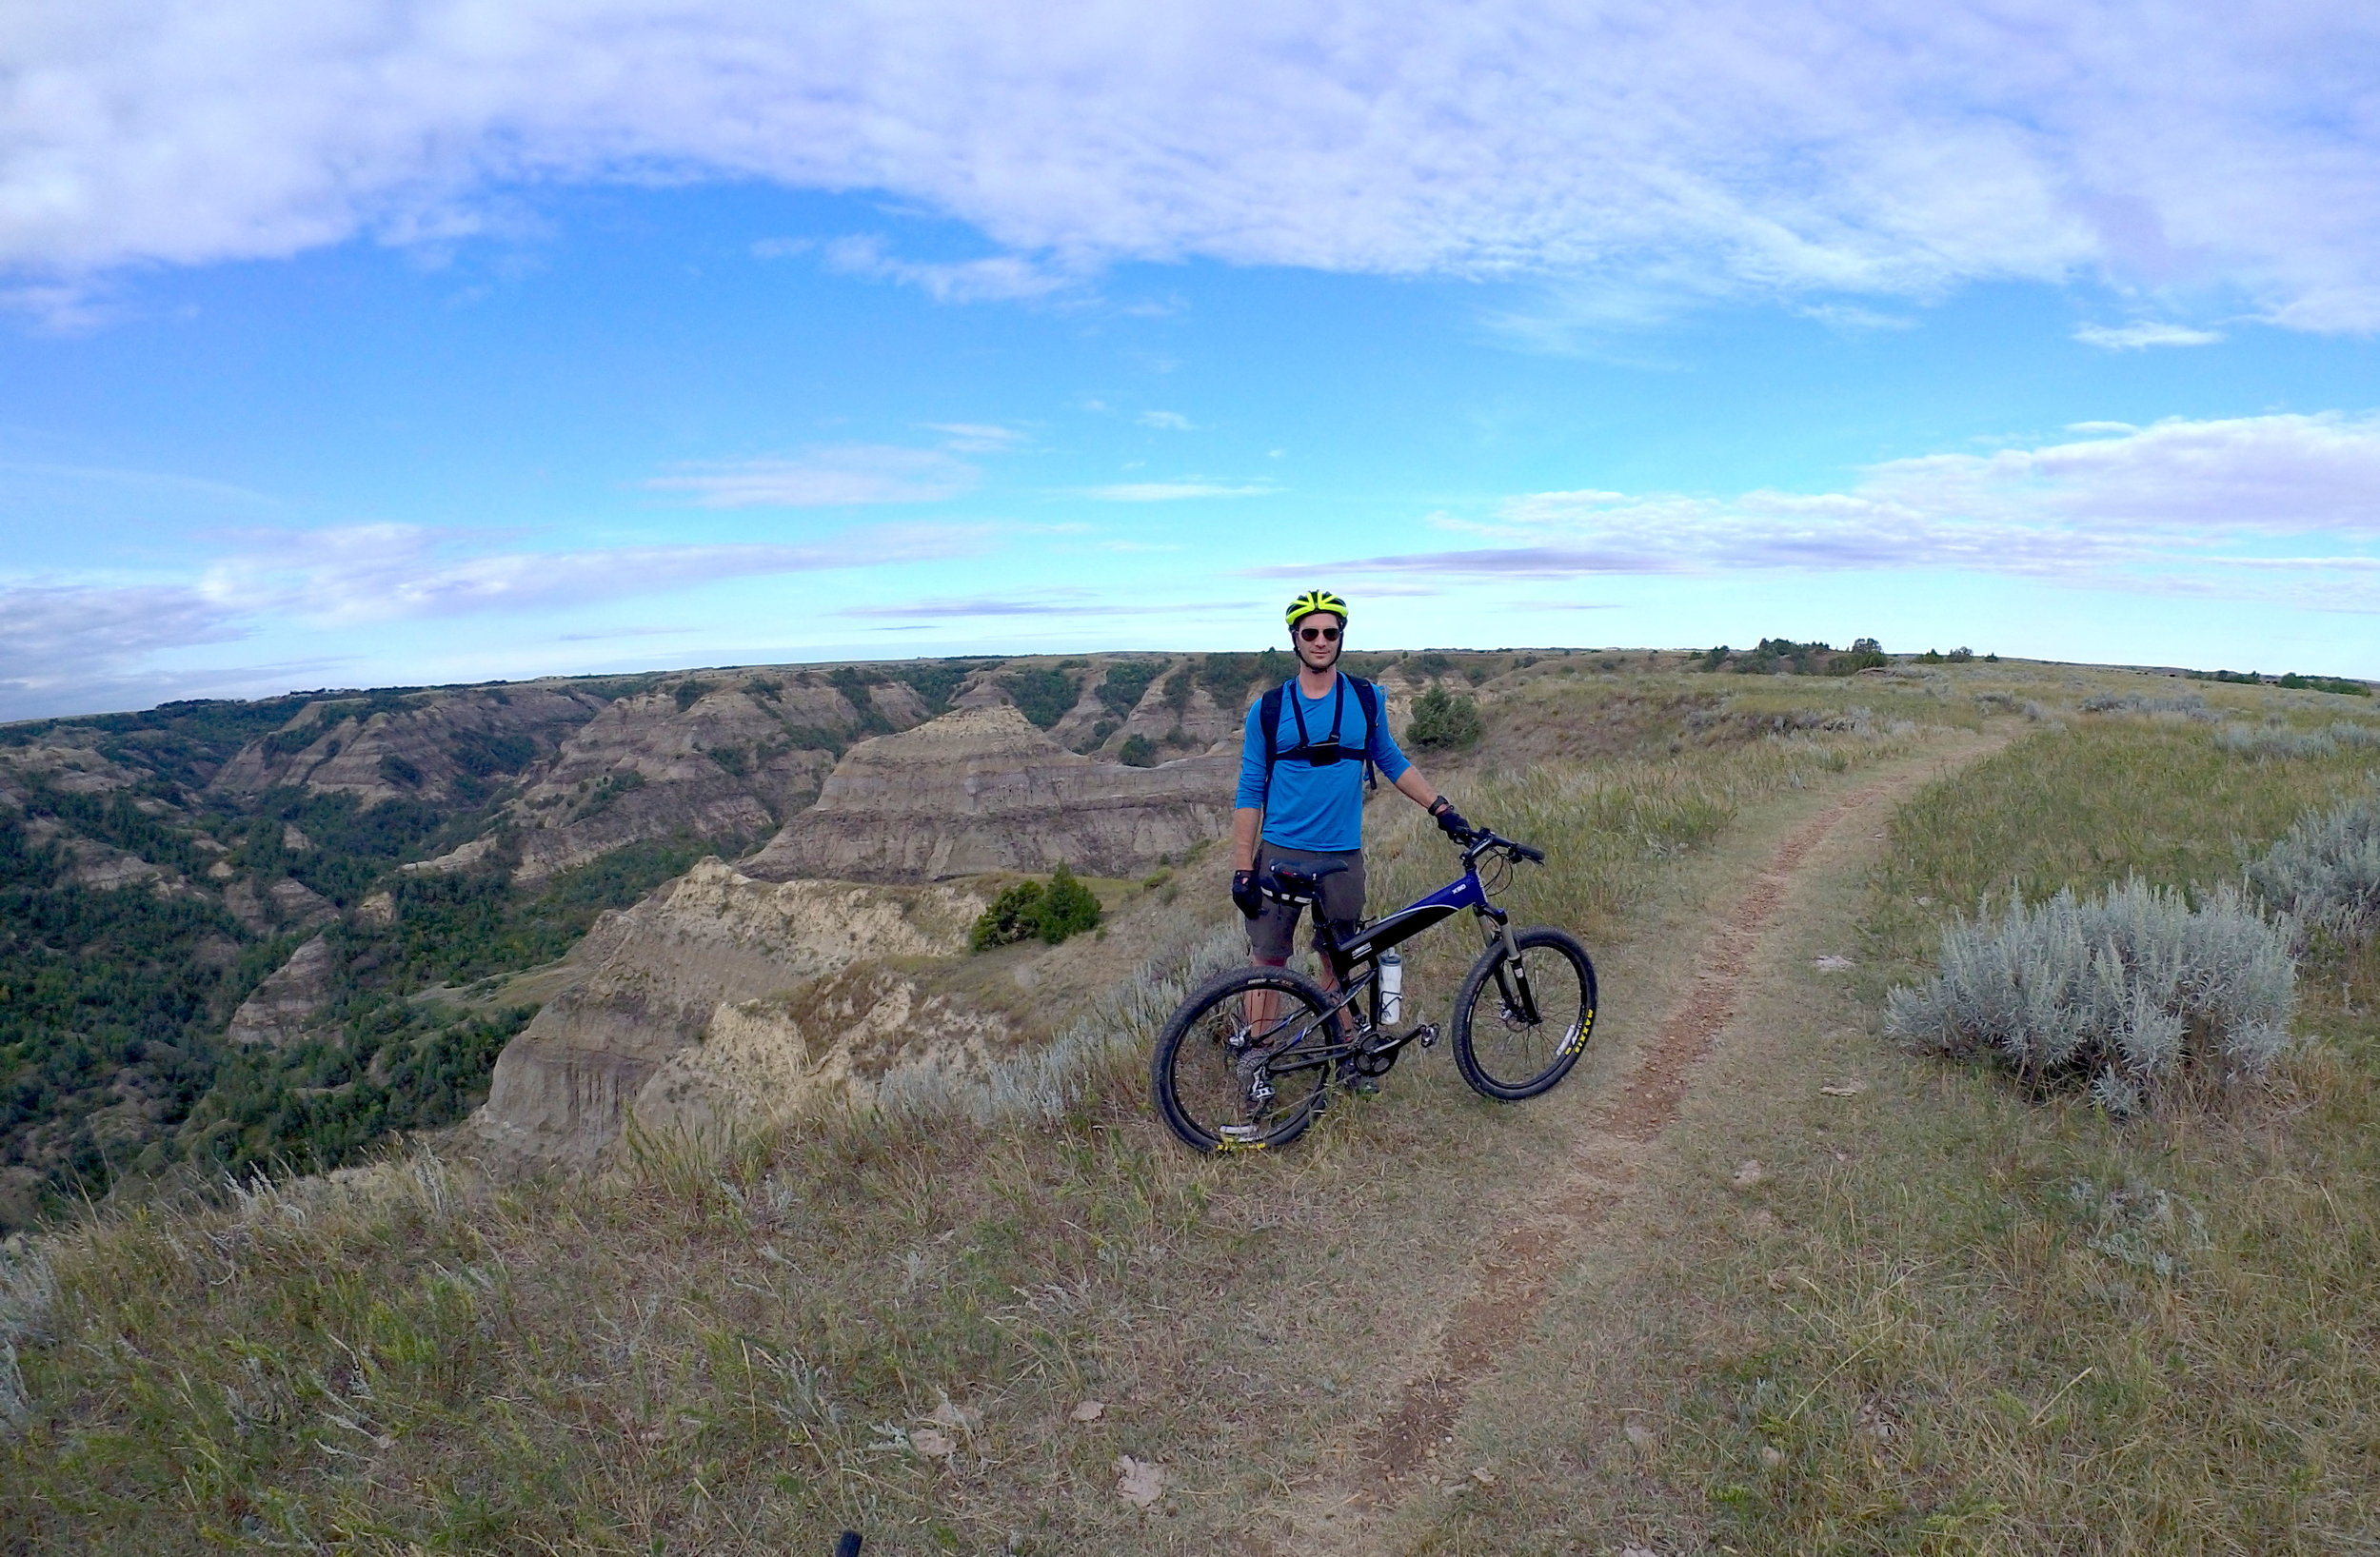 Maah Daah Hey trail, North Dakota